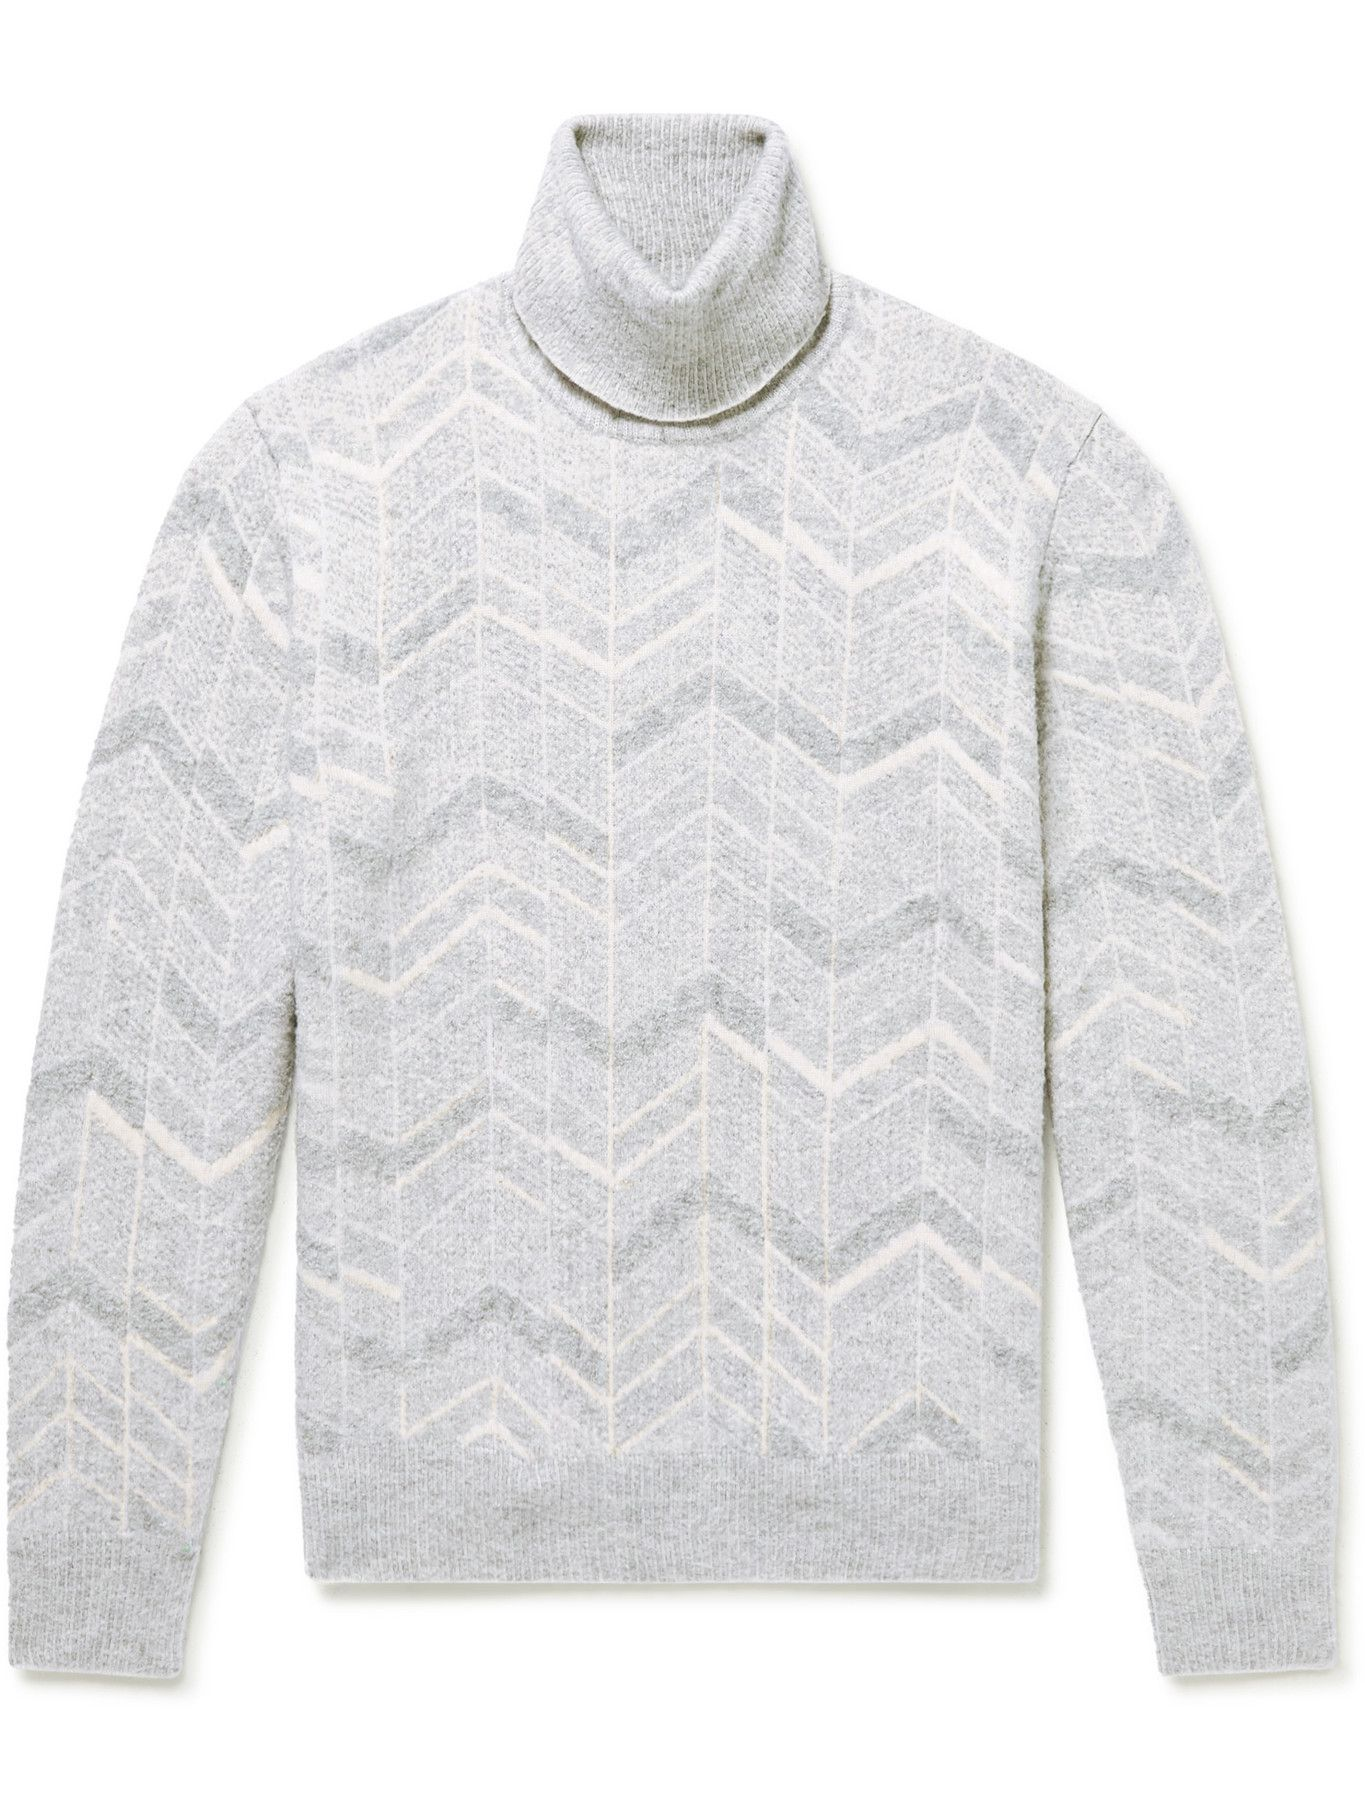 Photo: Ermenegildo Zegna - Cashmere, Wool and Silk-Blend Jacquard Rollneck Sweater - Gray